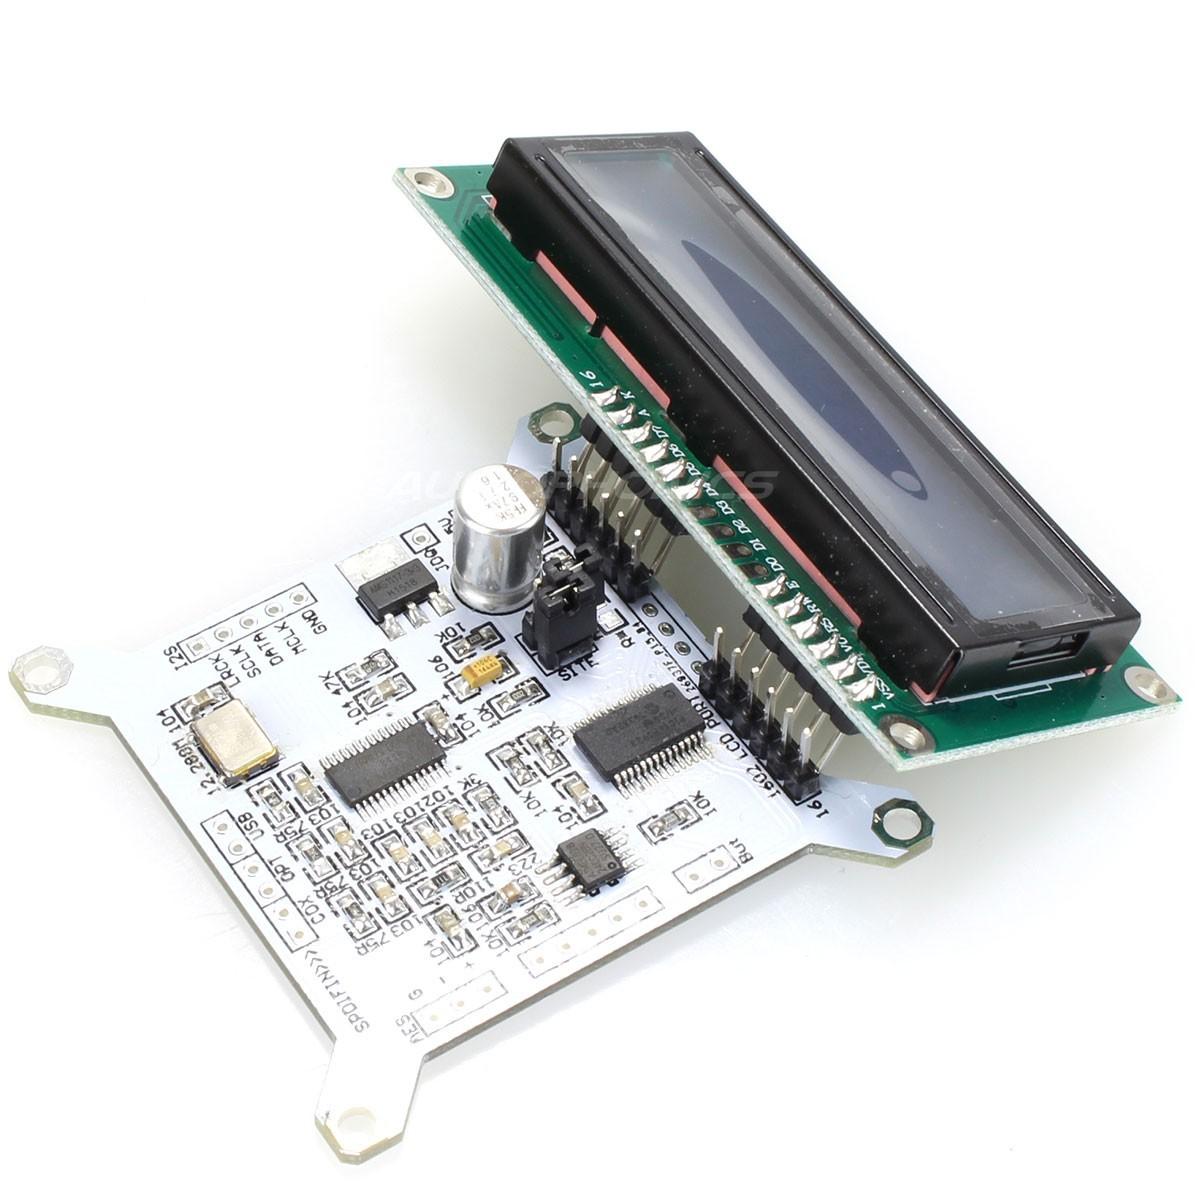 SPDIFx3 + AES/EBU input selector to I2S